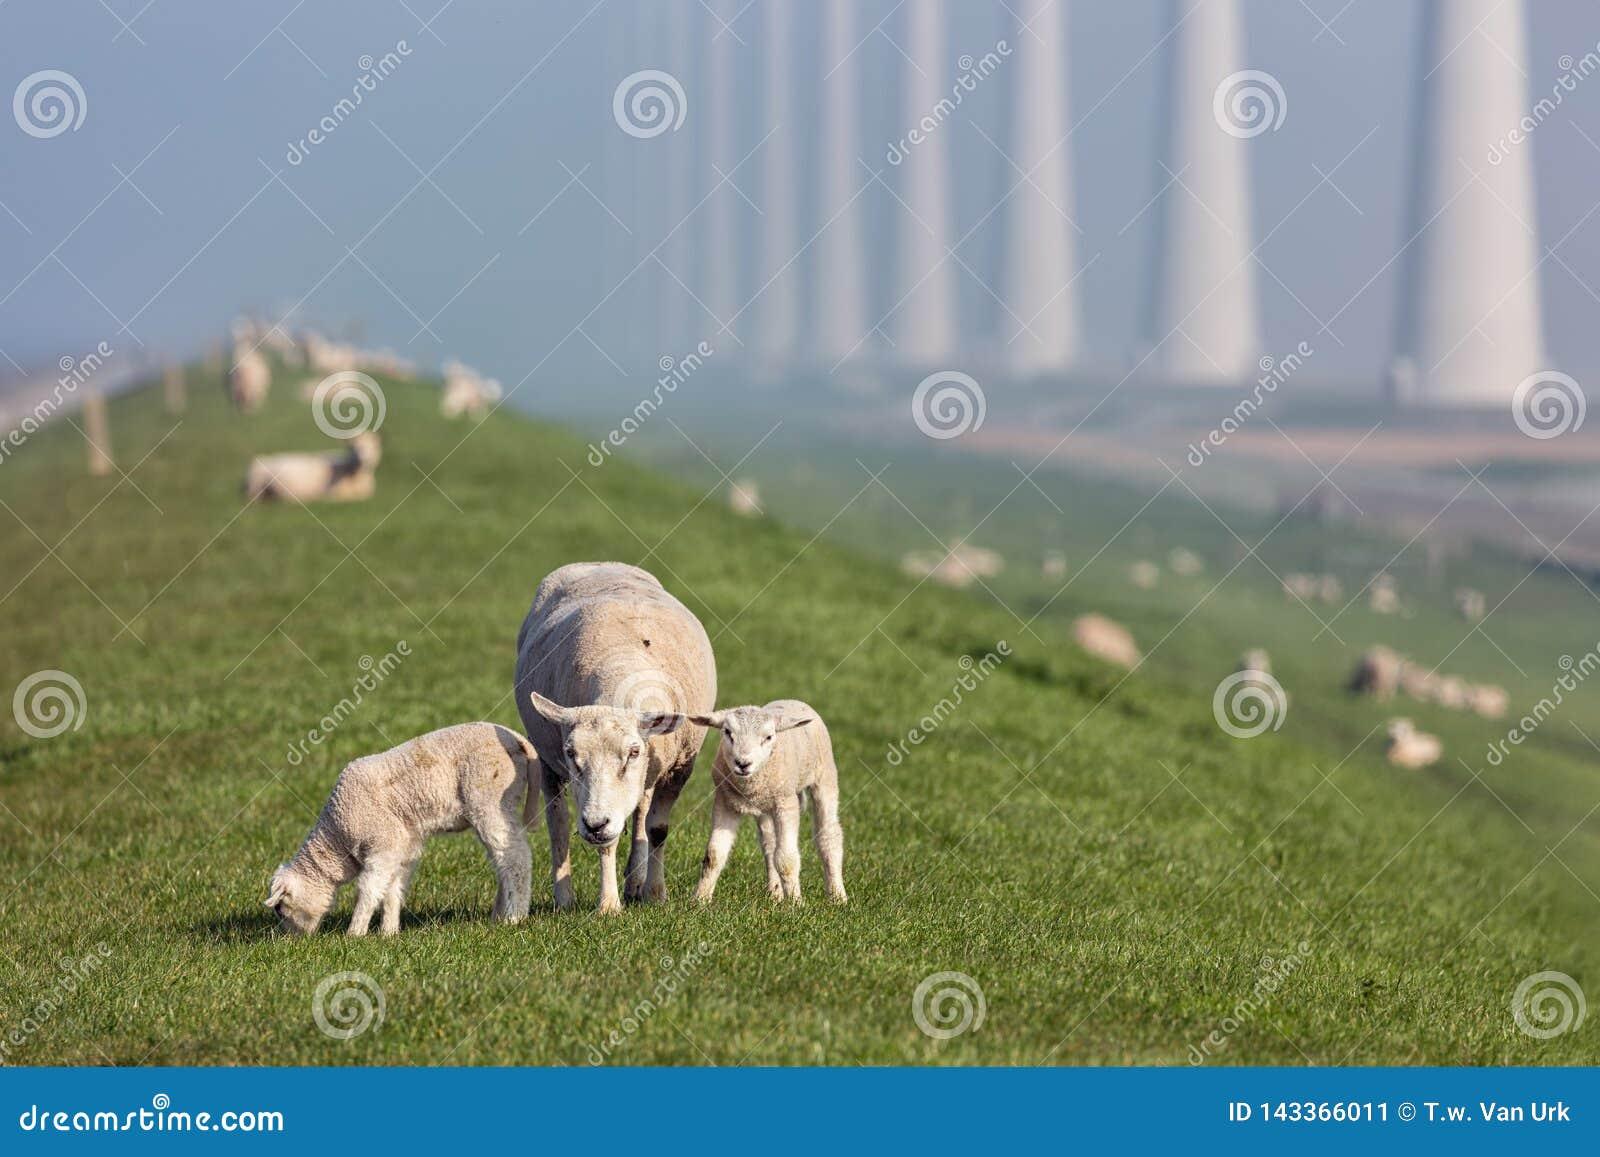 Sheep with lambs at dike near Dutch wind turbine farm